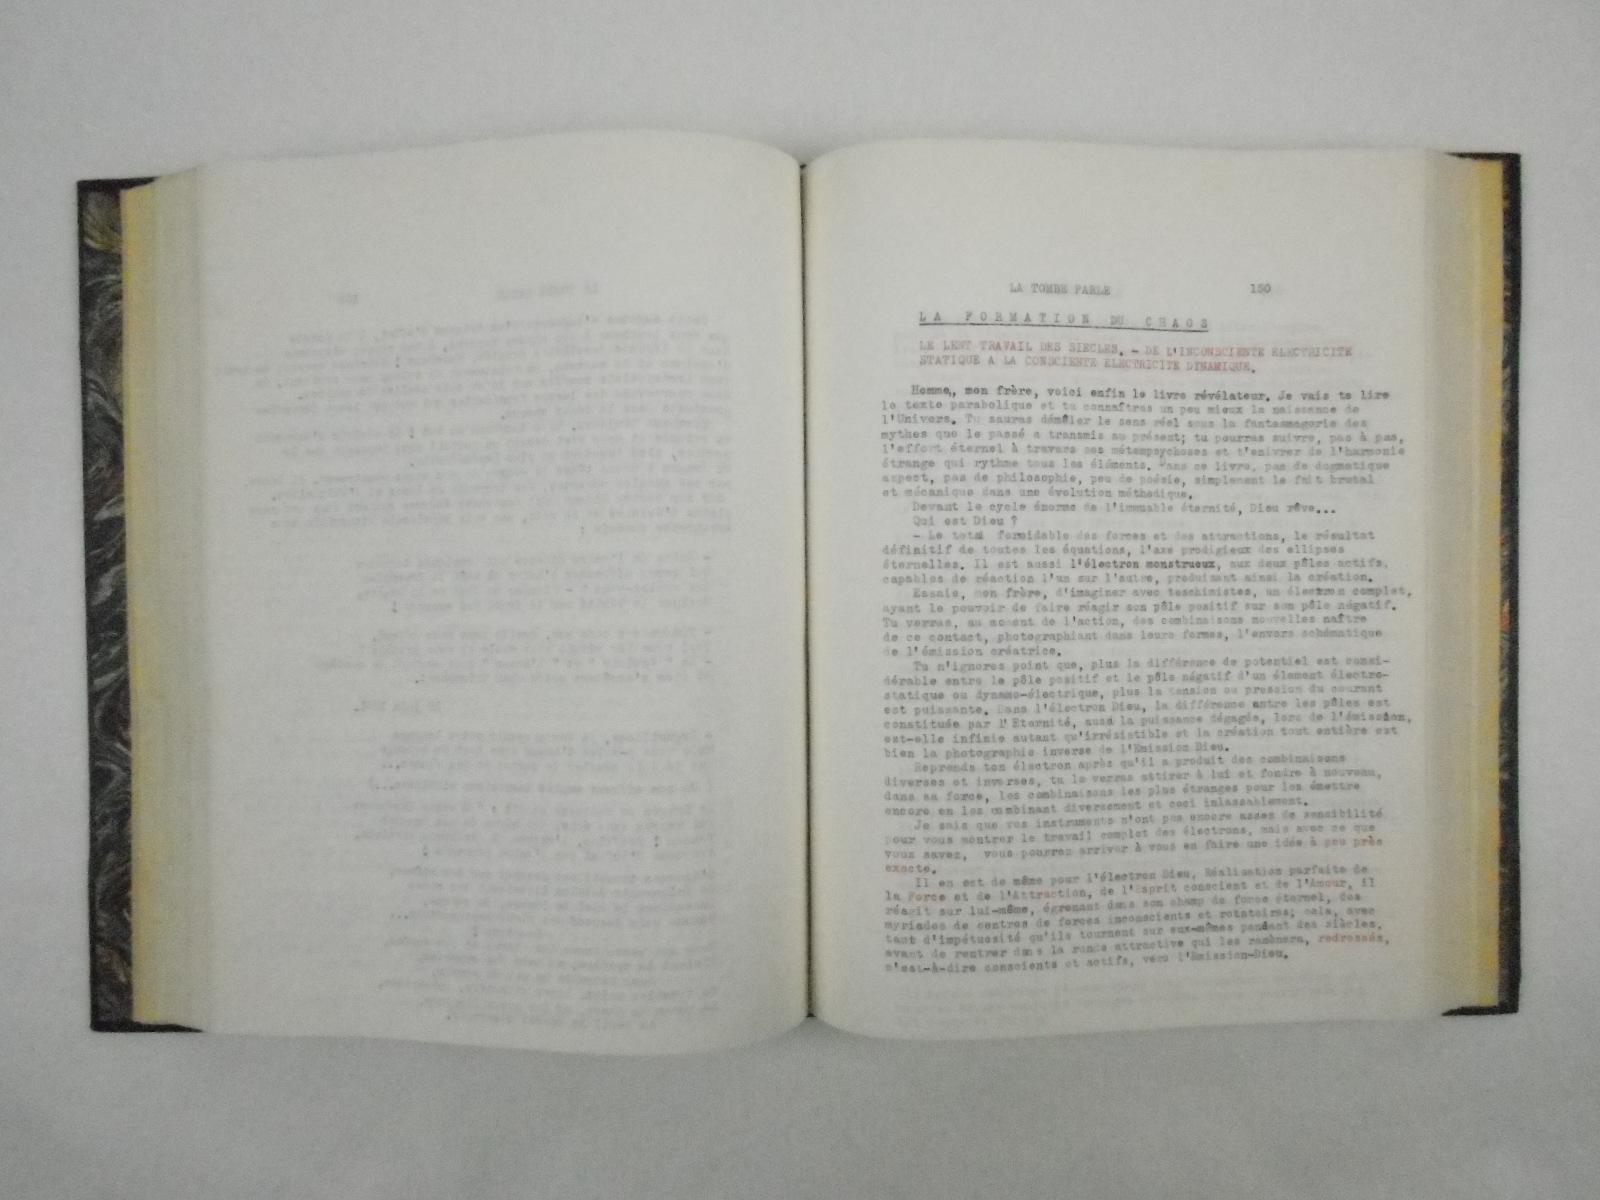 17959-3